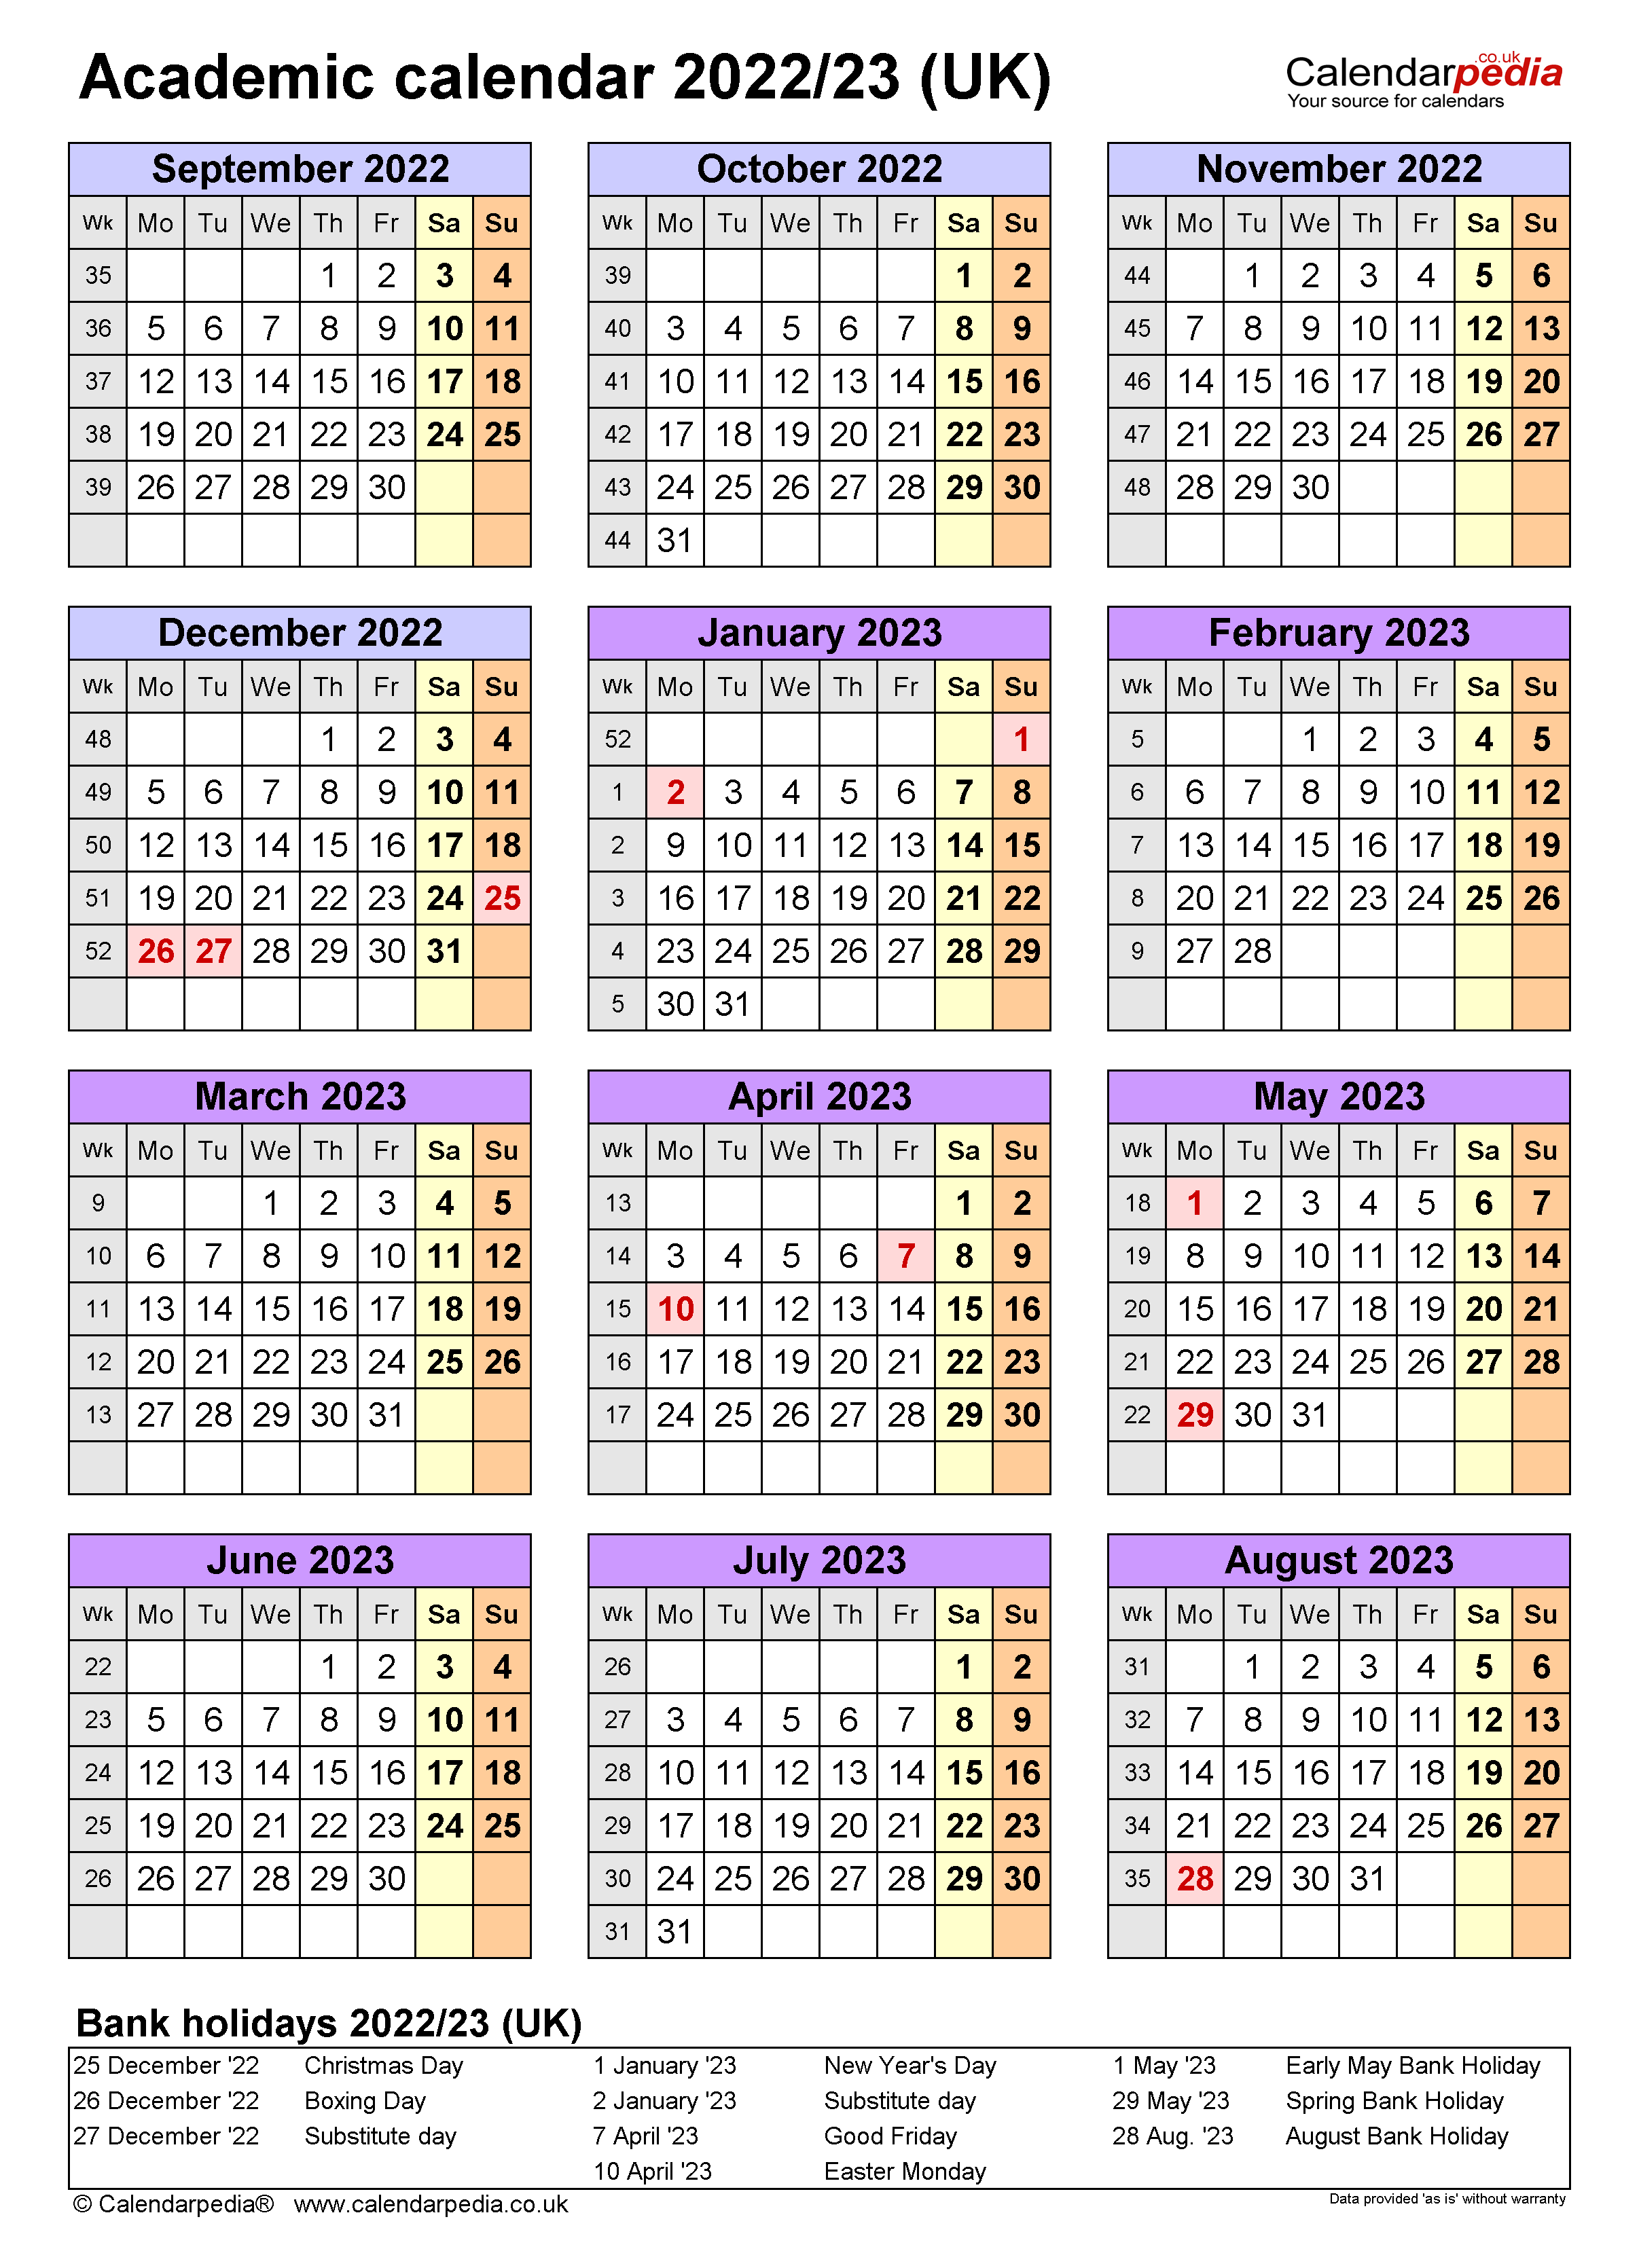 Academic Calendar 2022 23.Academic Calendars 2022 23 Uk Free Printable Excel Templates